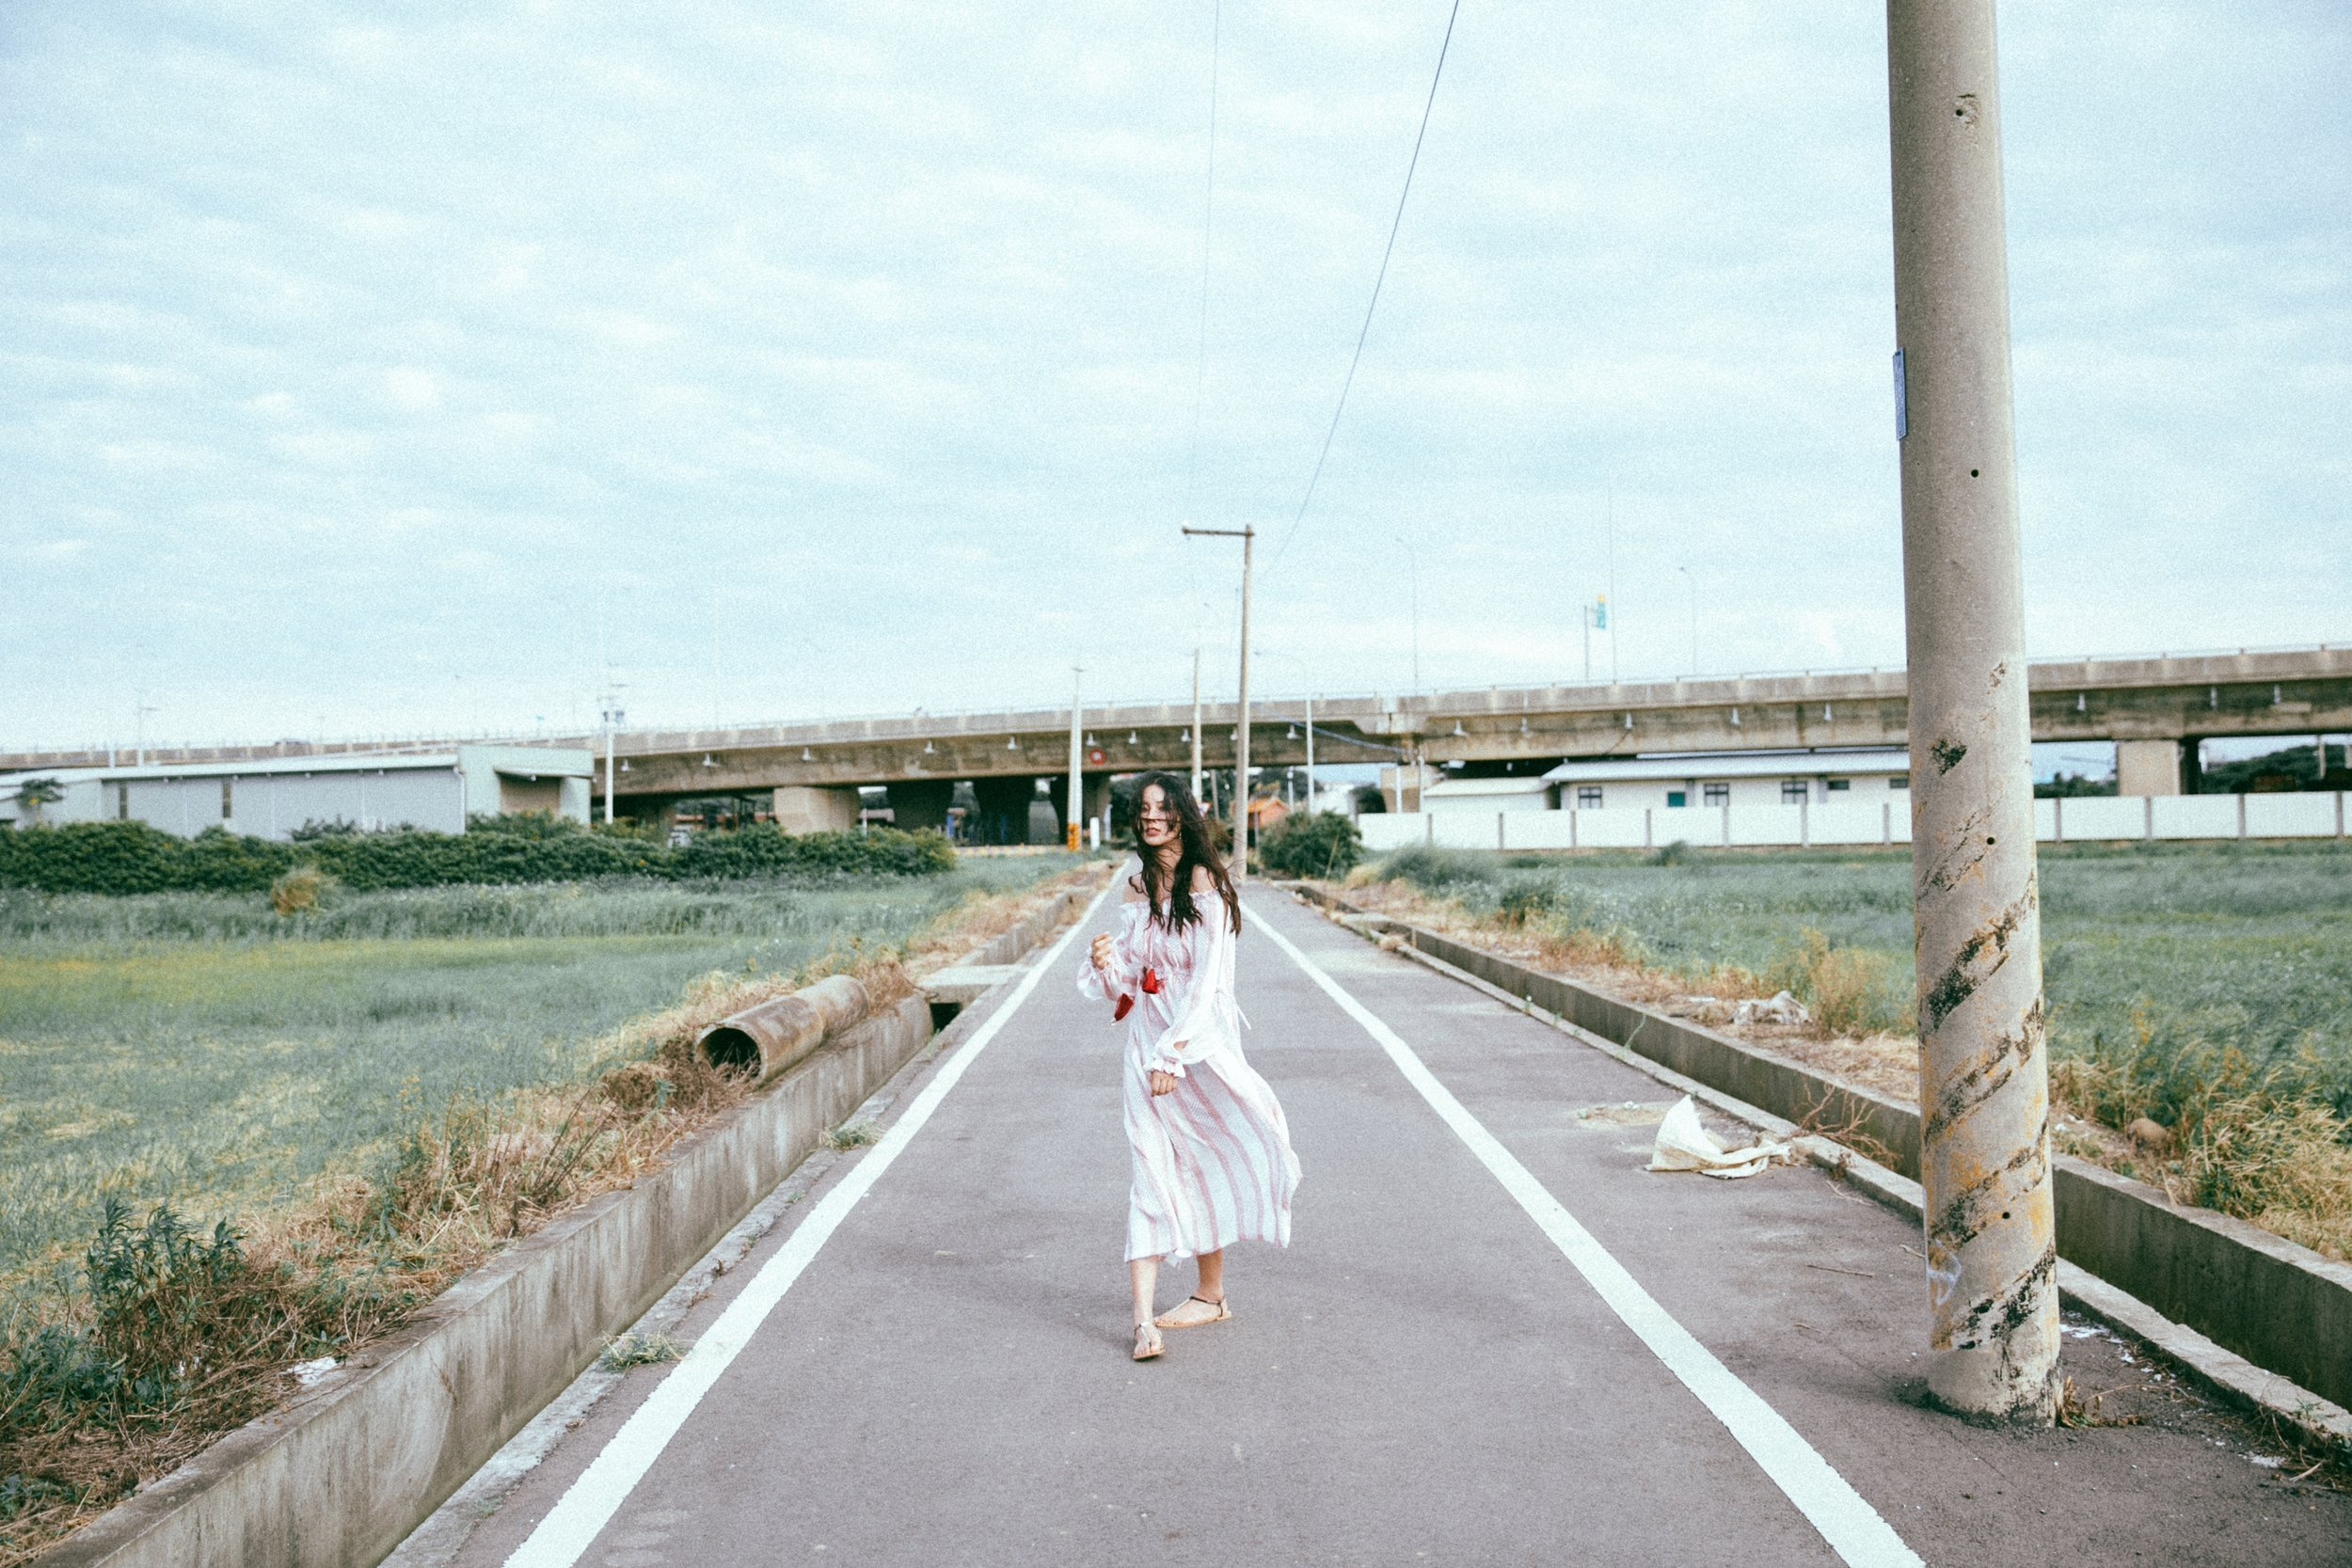 portrait-jane-girl-寫真-許厝港-桃園-14.jpg